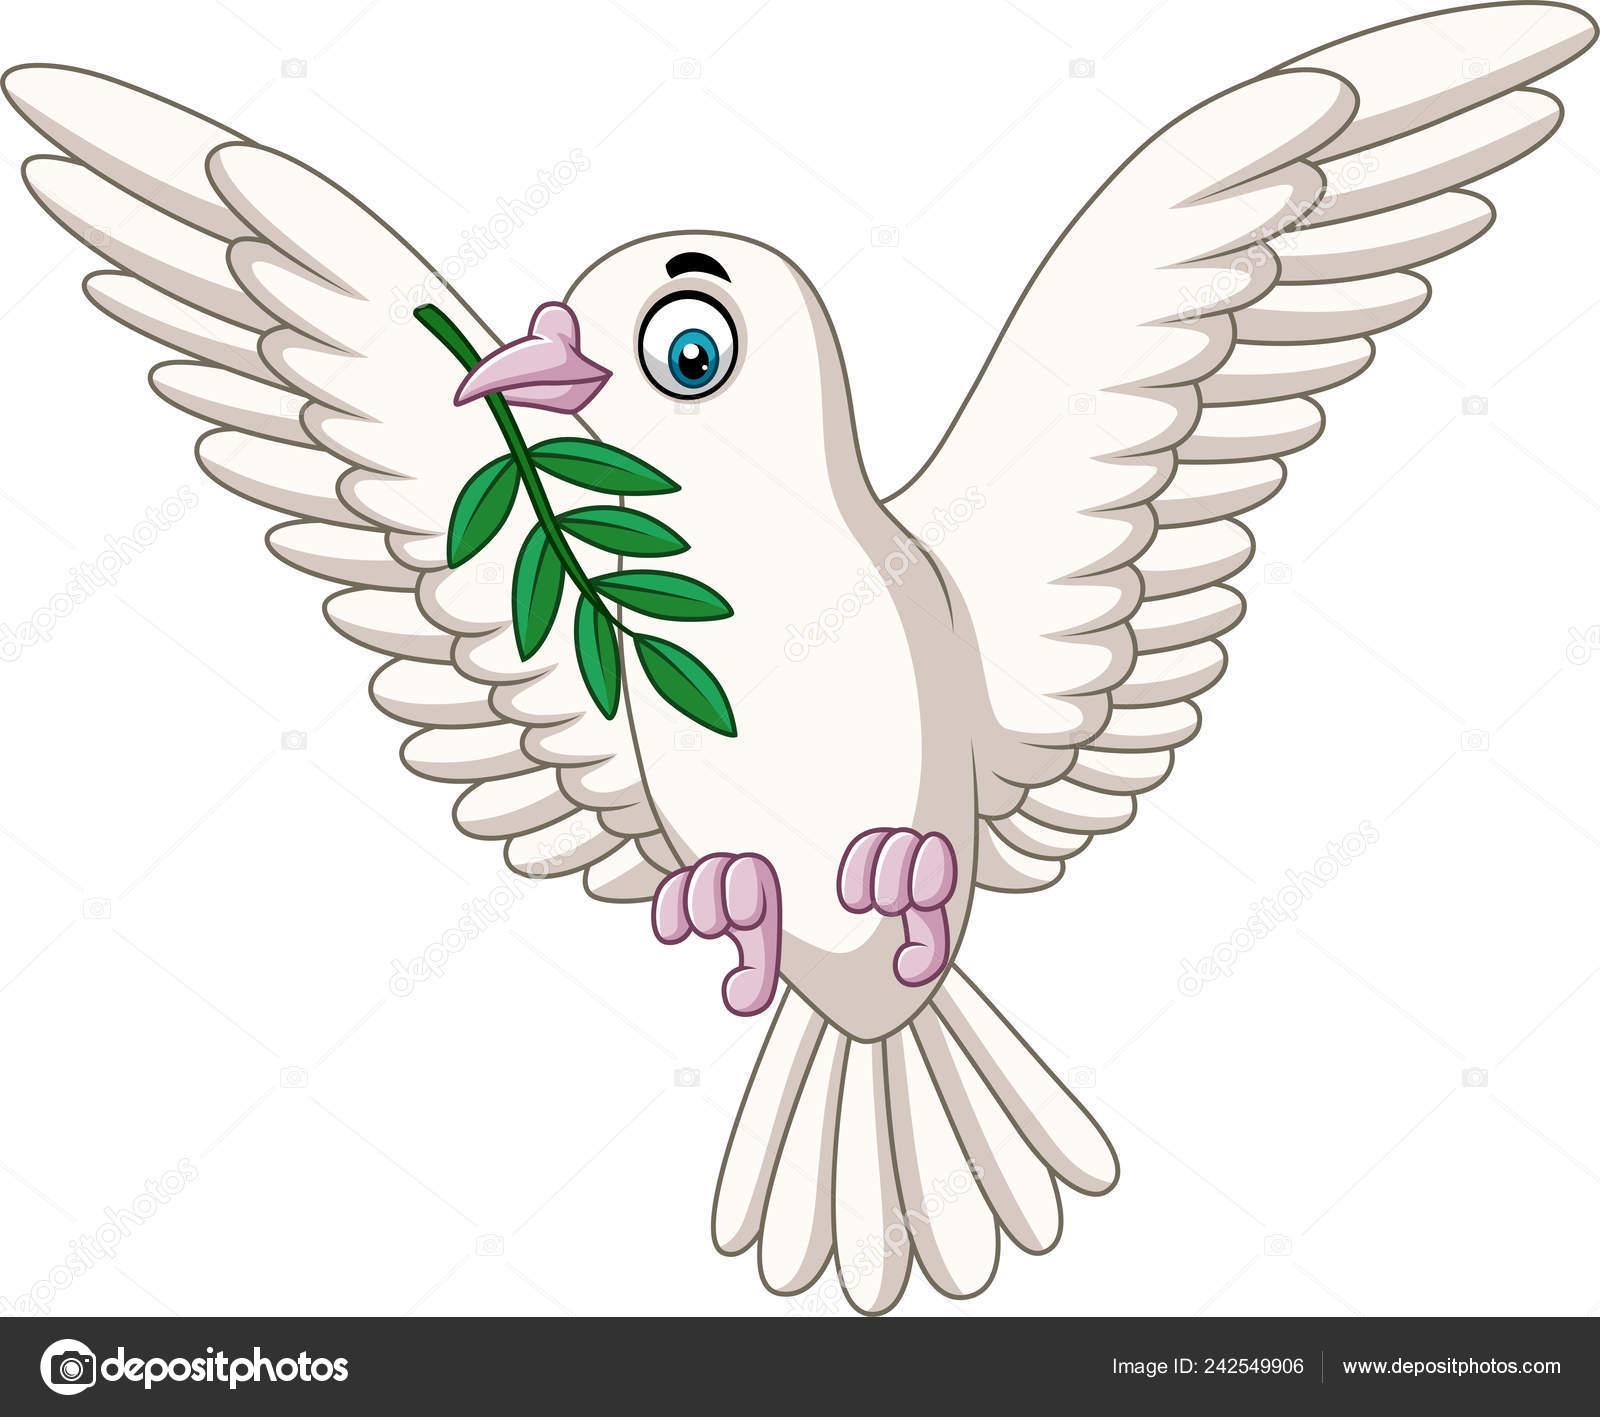 Vector Illustration Cartoon Dove Olive Branch Stock Vector C Tigatelu 242549906